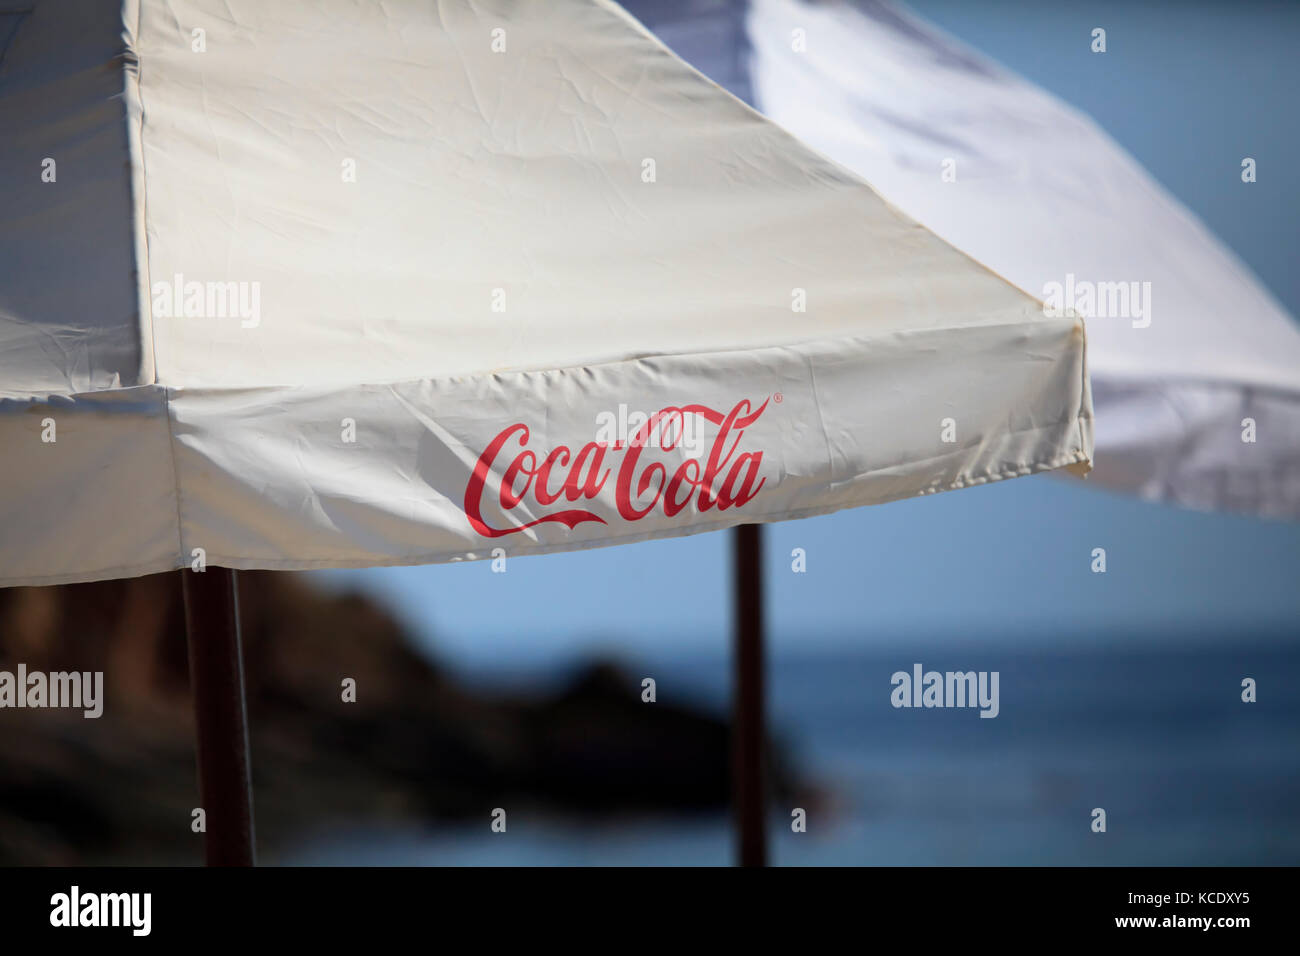 SOFIA, BULGARIA - SEPTEMBER 24, 2017: Coca-Cola text on umbrela near sea beach. Coca-cola is the world's most - Stock Image